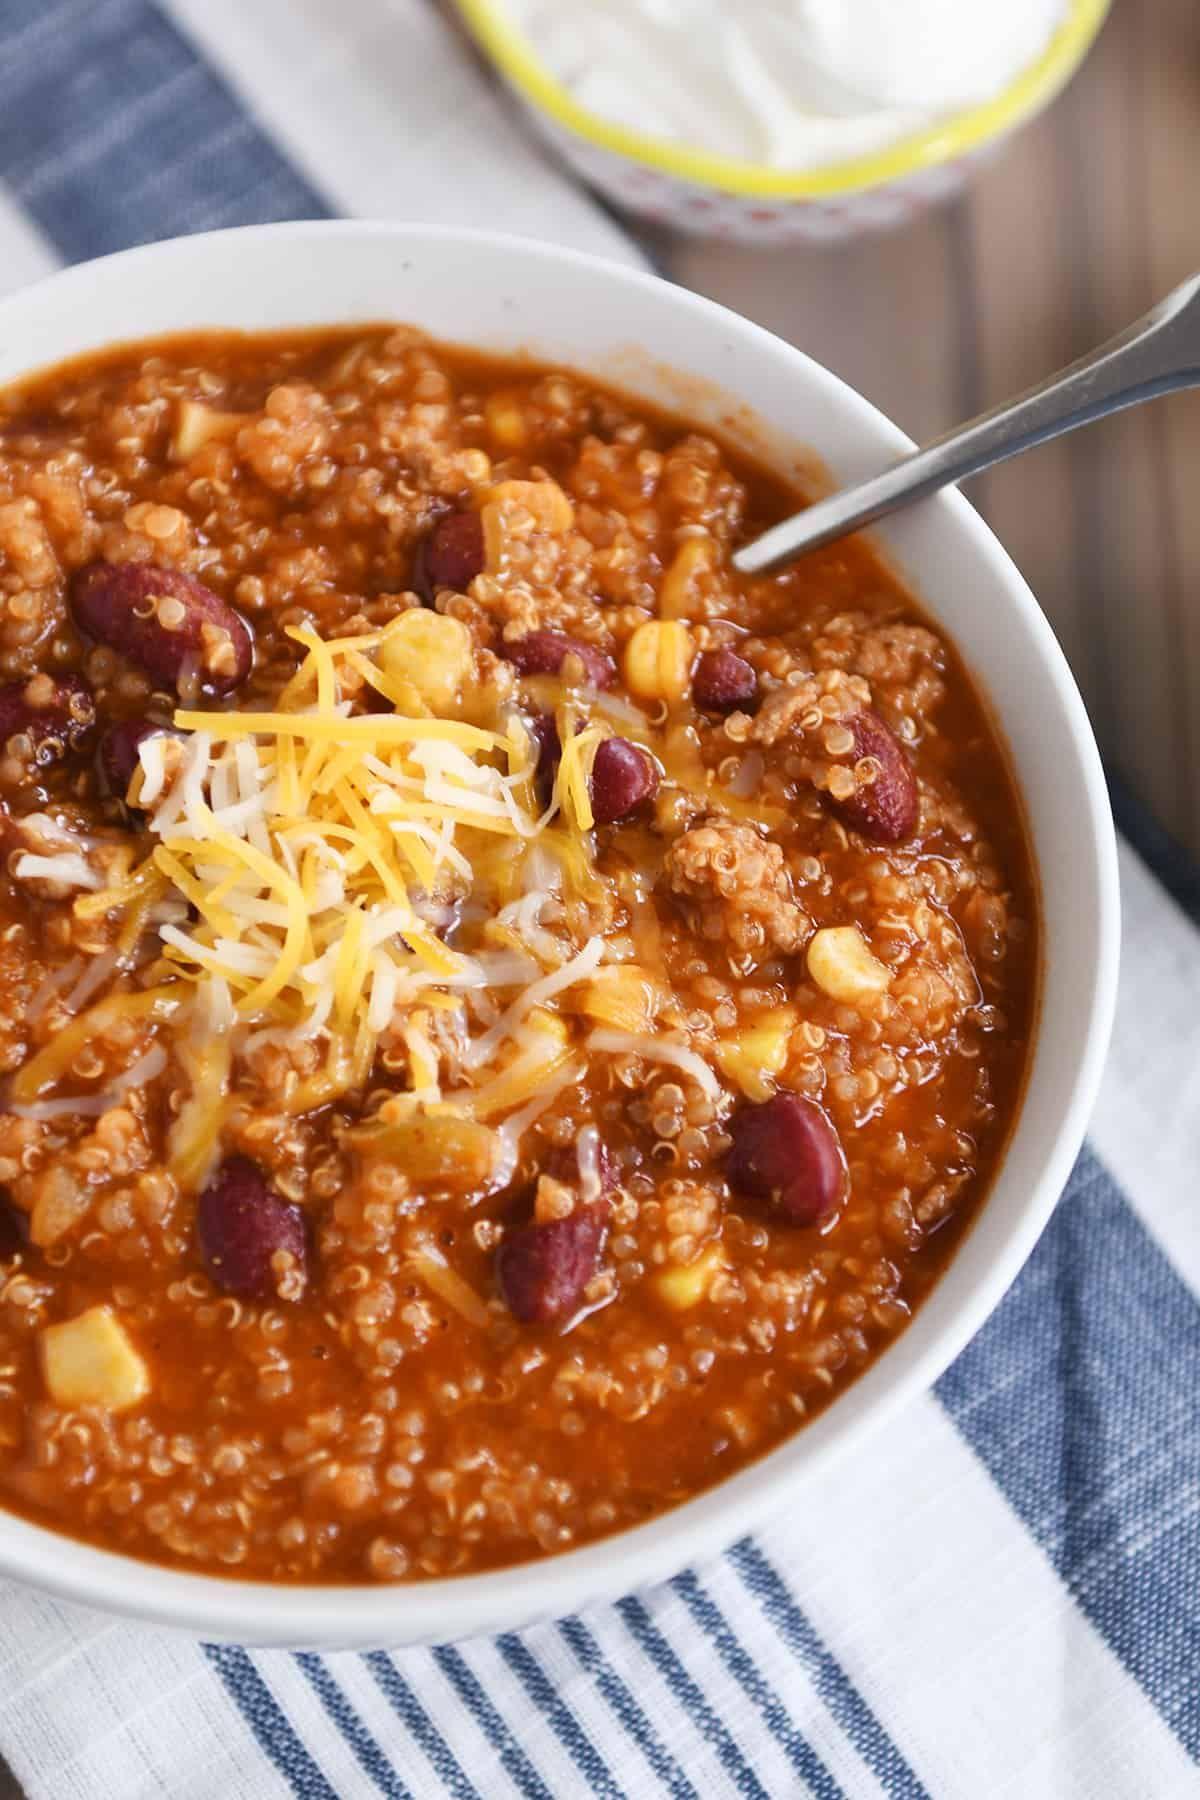 Photo of Quinoa Red Bean Chili